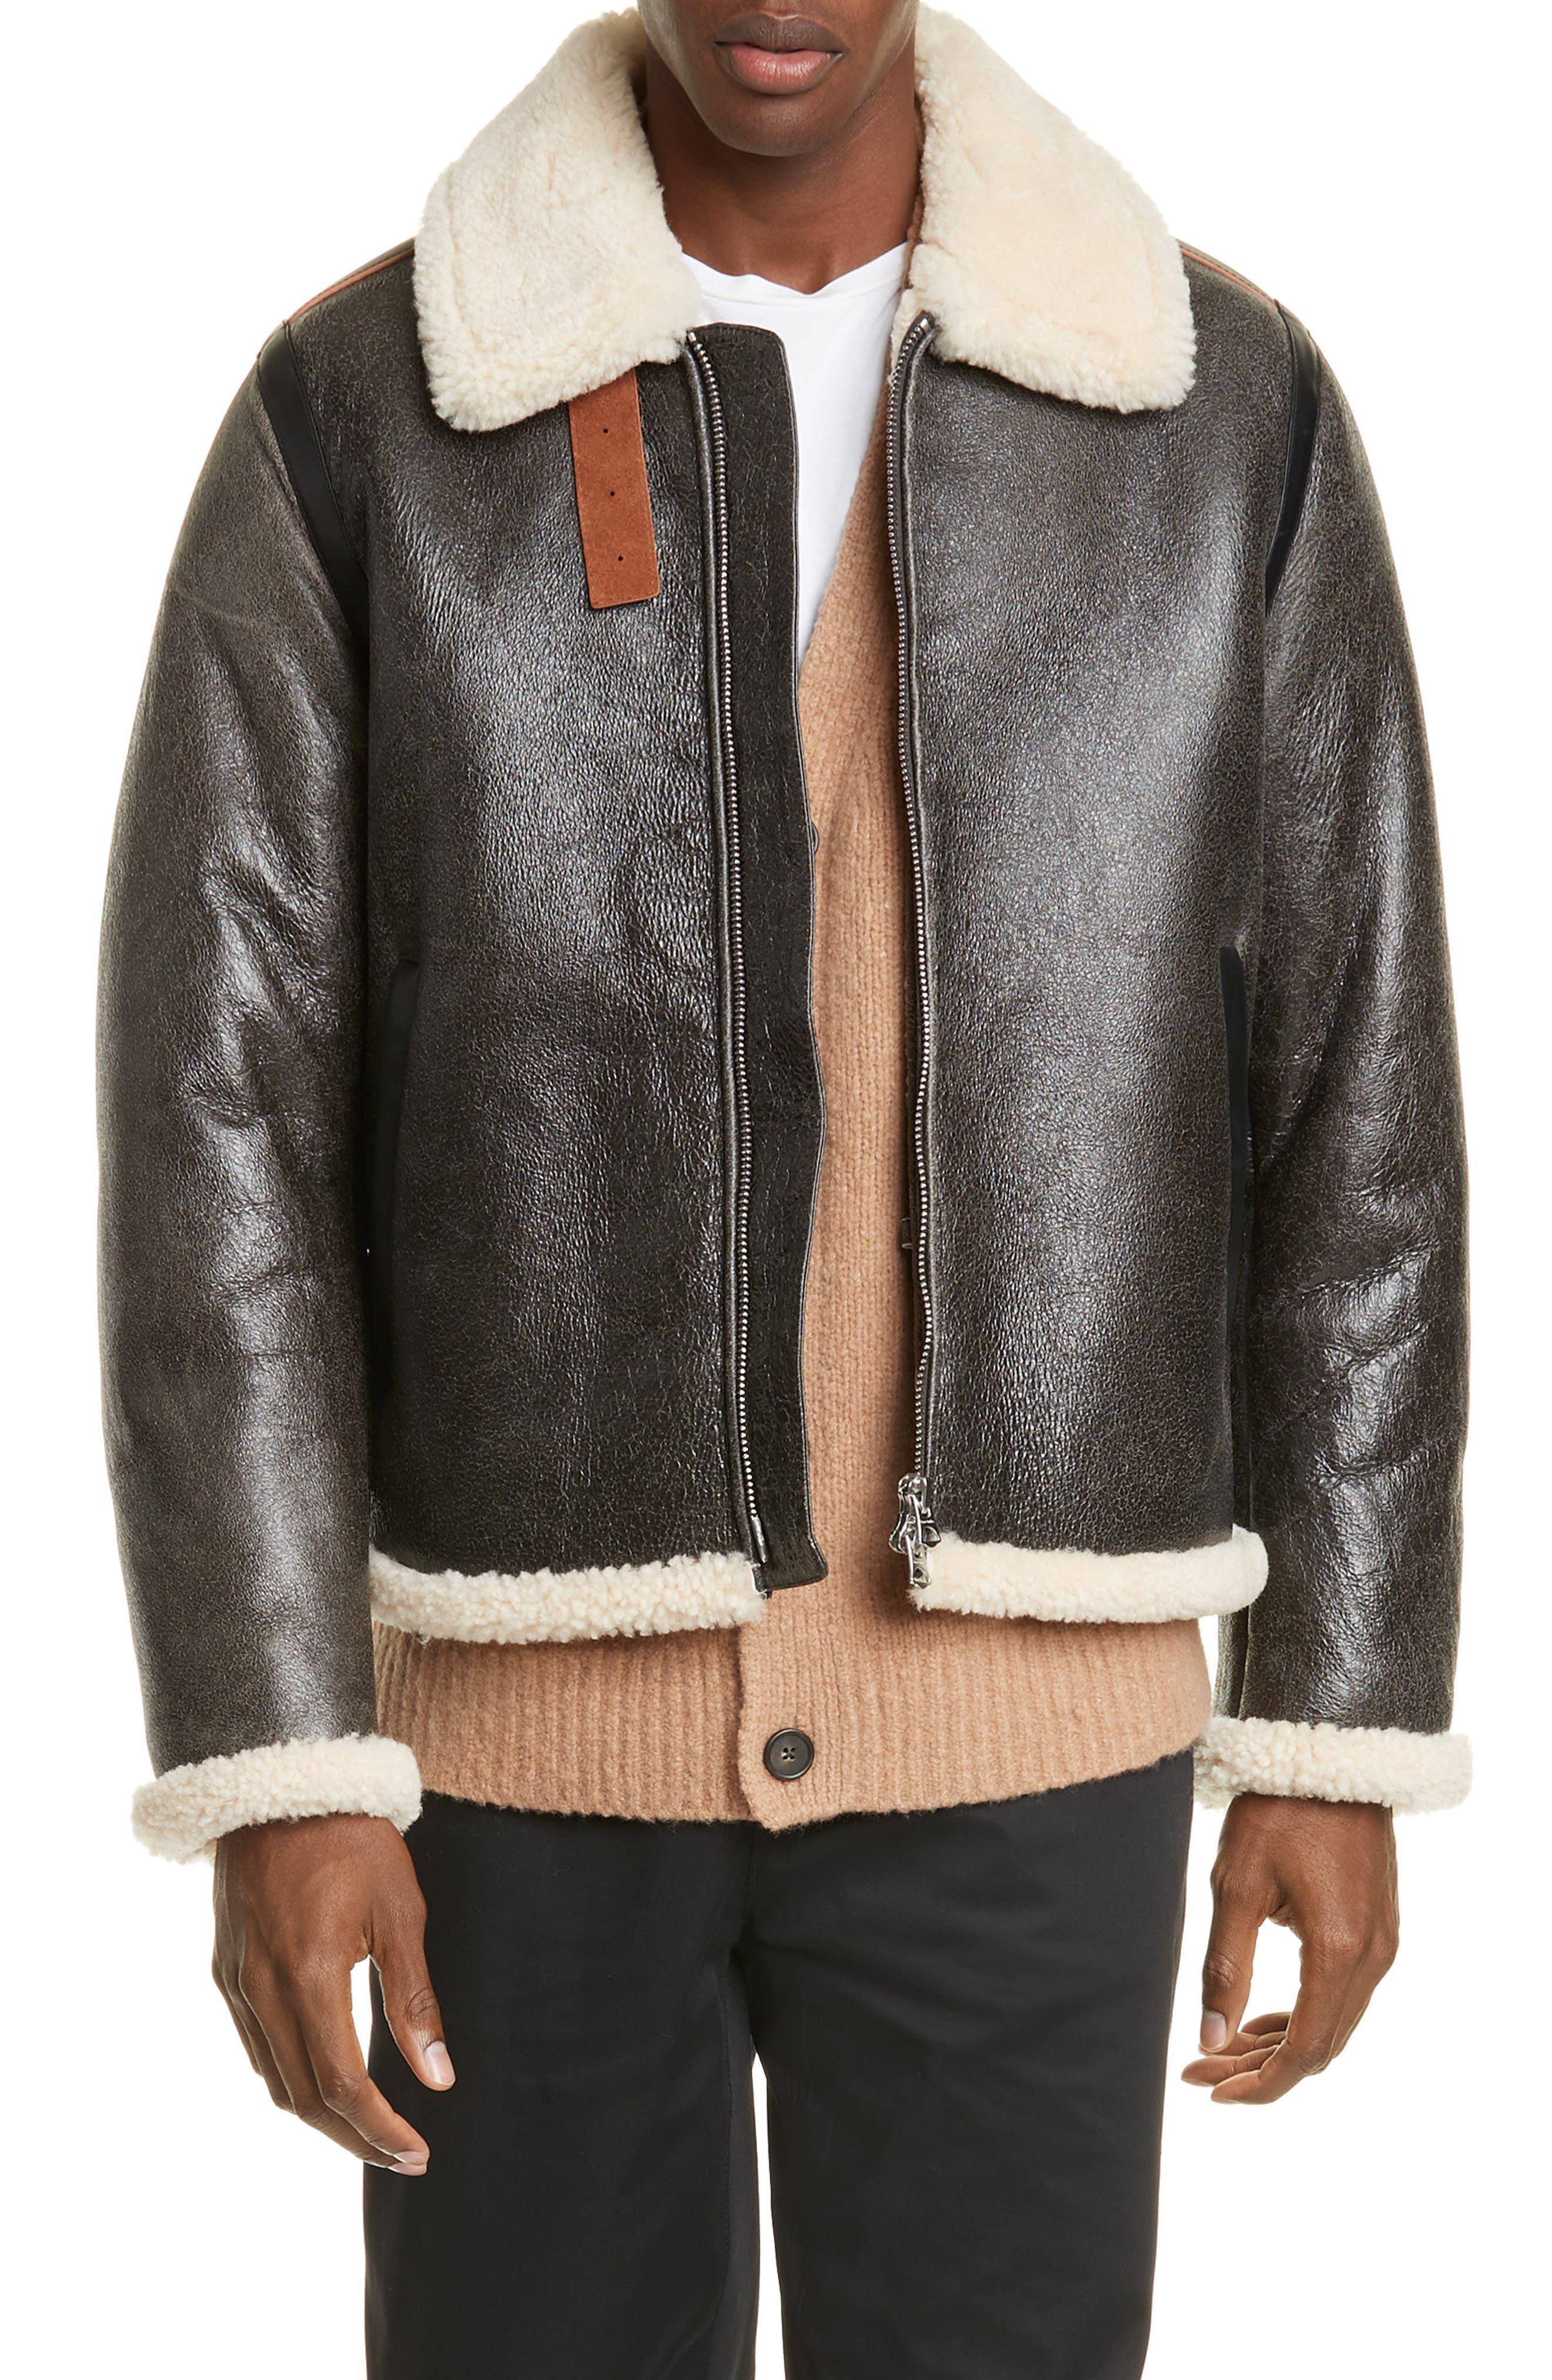 Men's Leather (Genuine) Coats & Jackets | Nordstrom